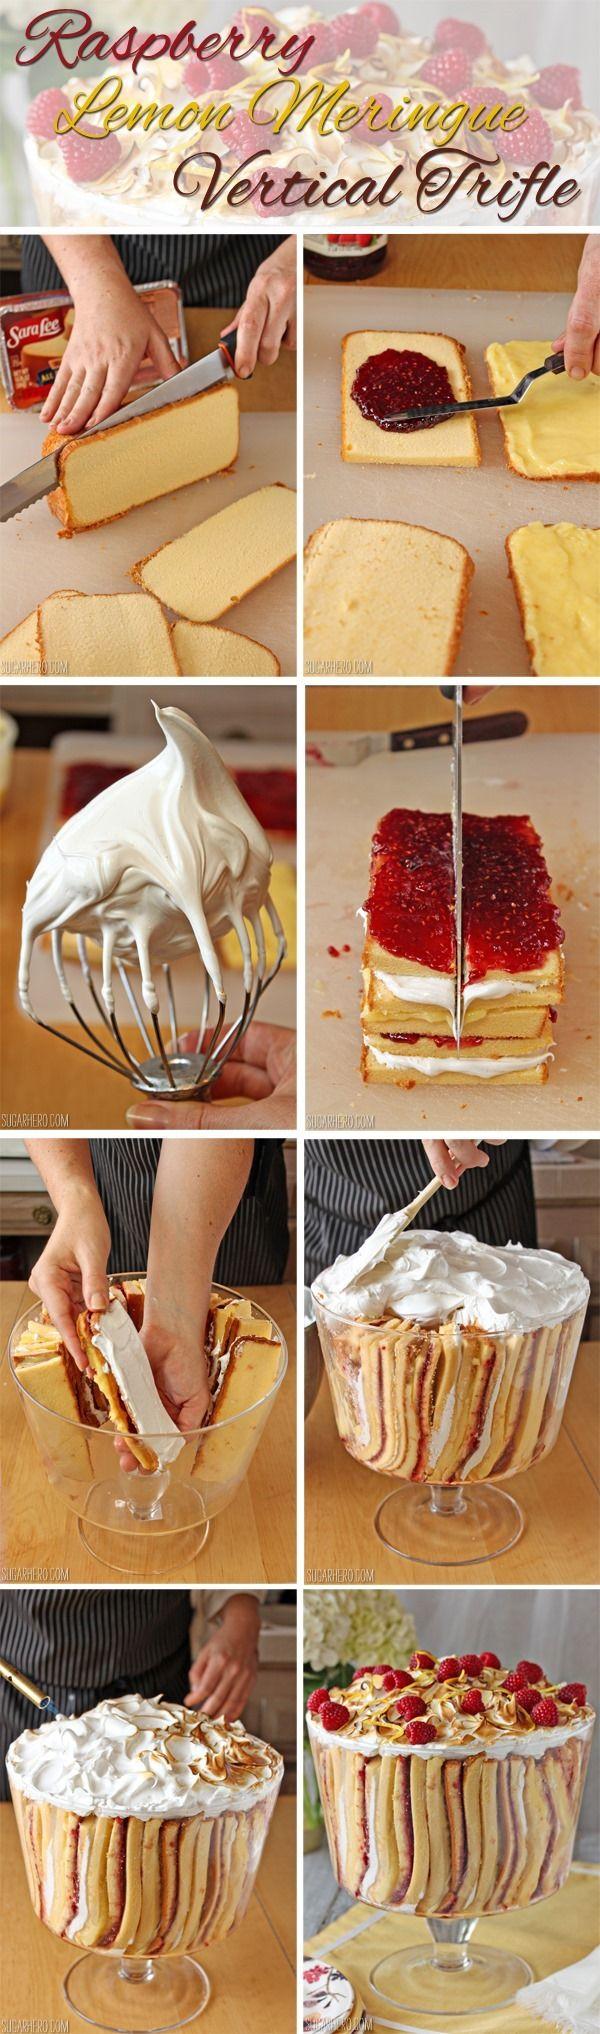 how to make sara lee pound cake